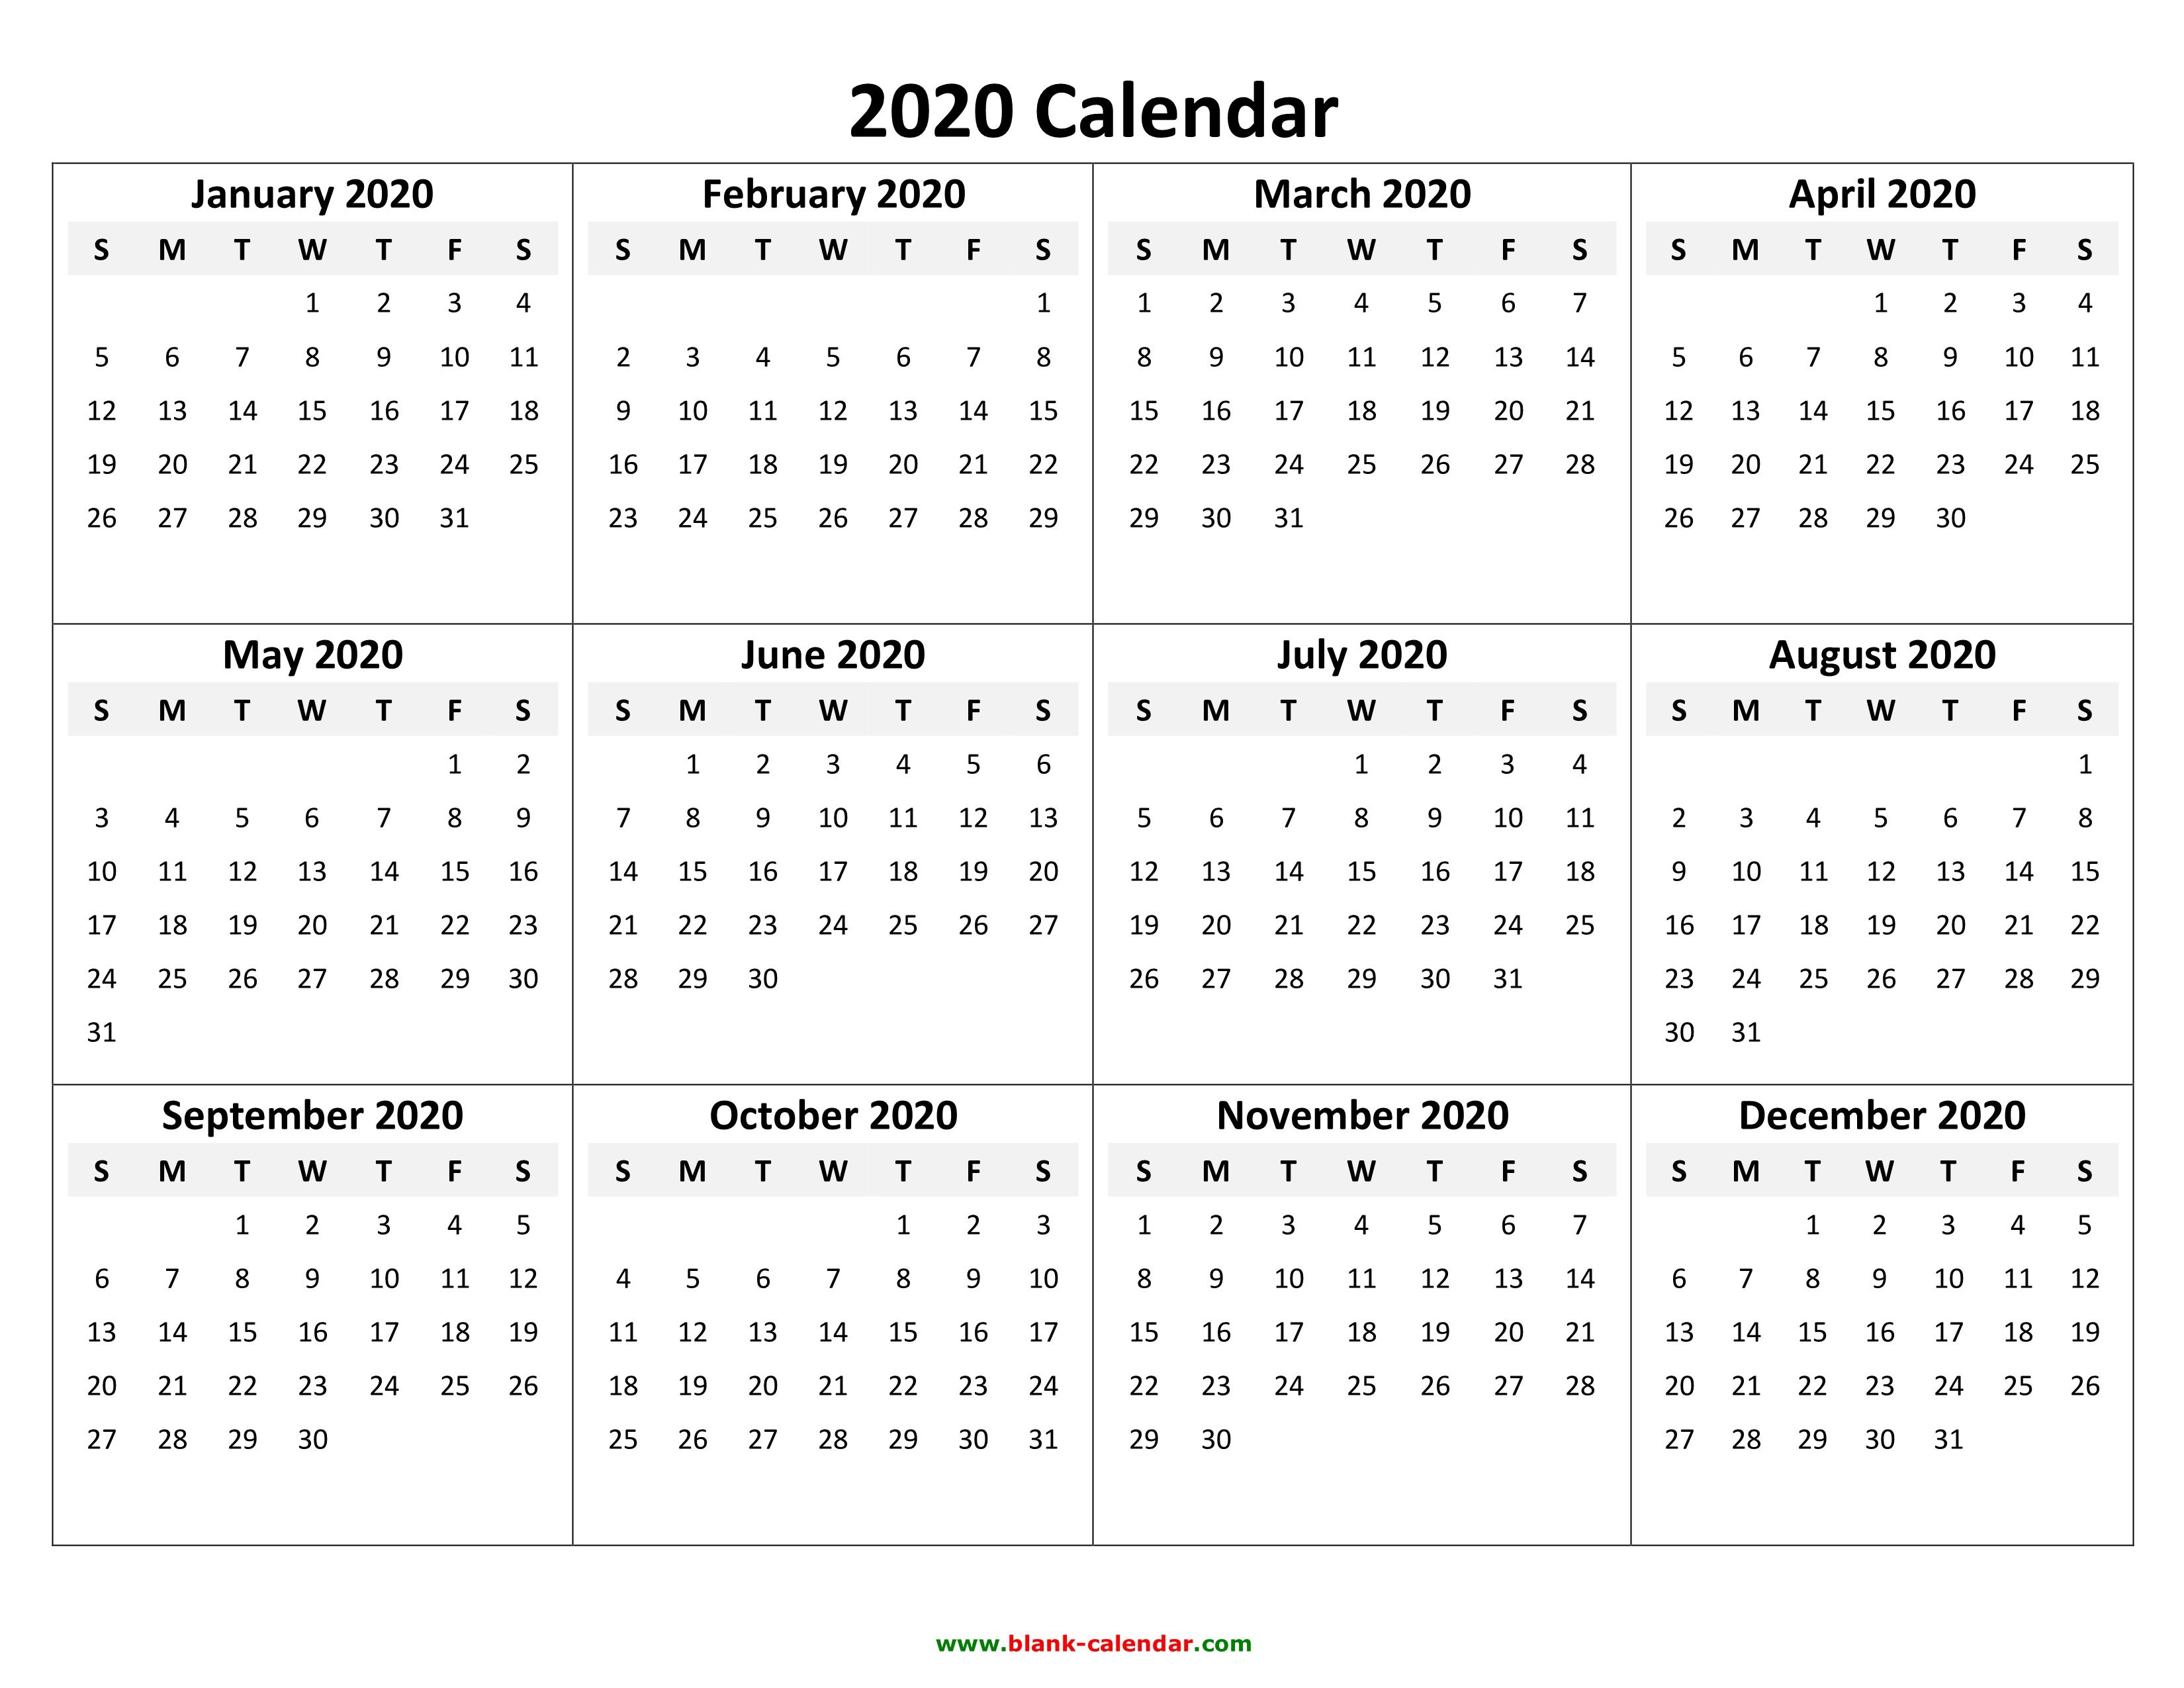 Free Yearly Calendar 2020 Printable - Wpa.wpart.co throughout Vertex Calendars 2020 Printable